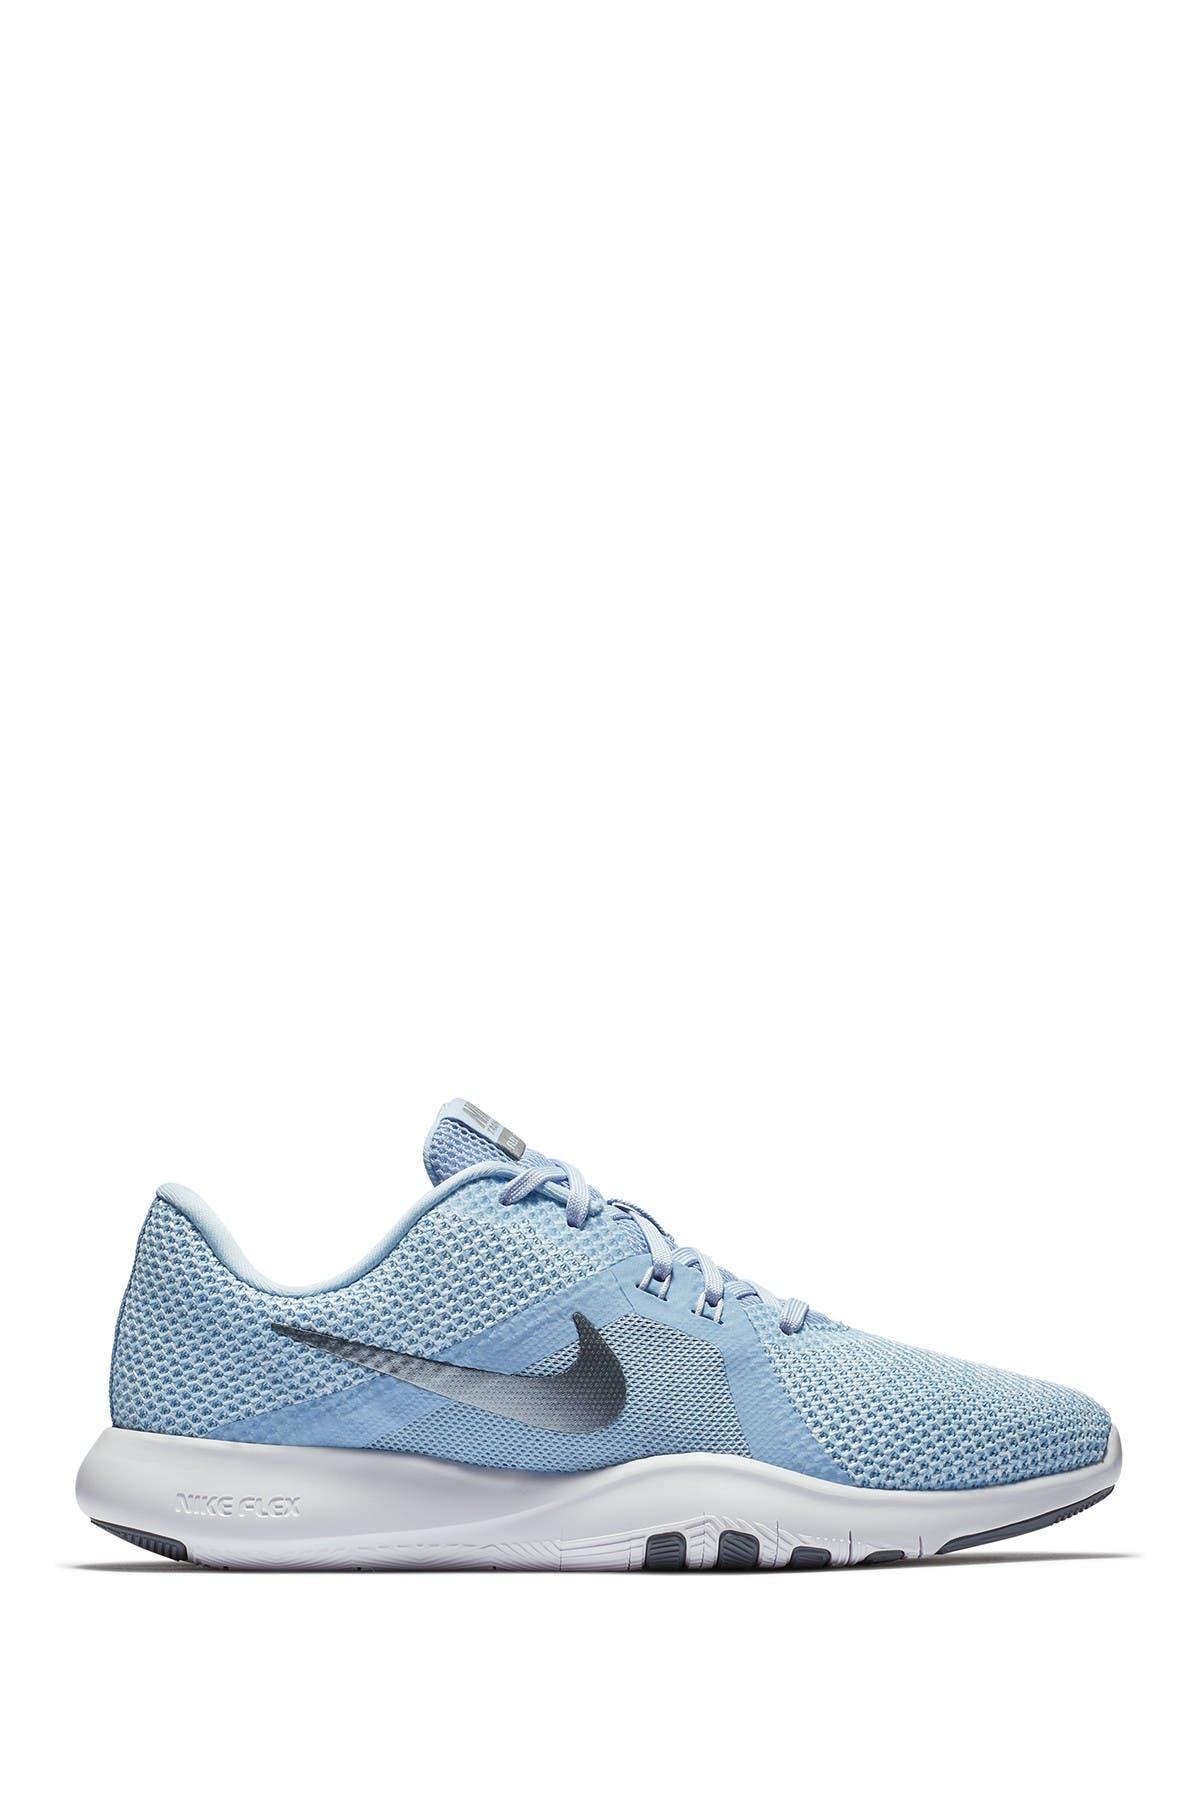 Image of Nike Flex Trainer 8 Sneaker